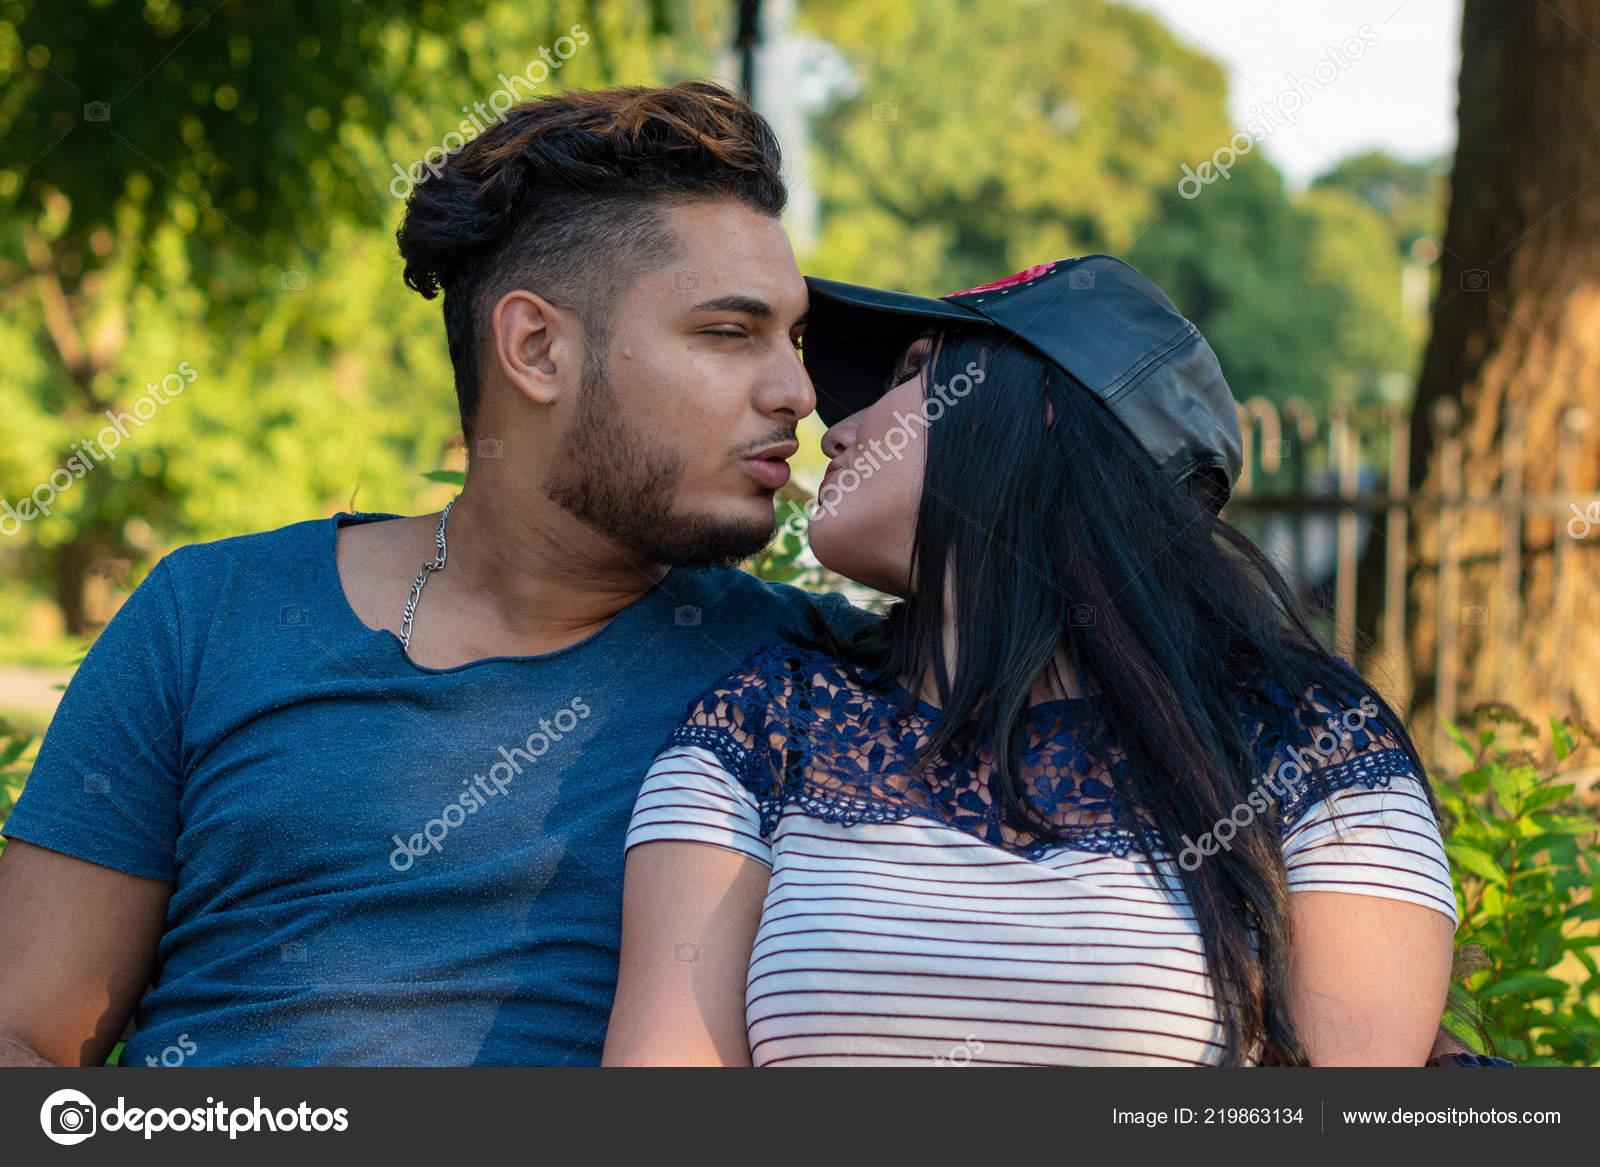 dating hjemmeside for naturelskere